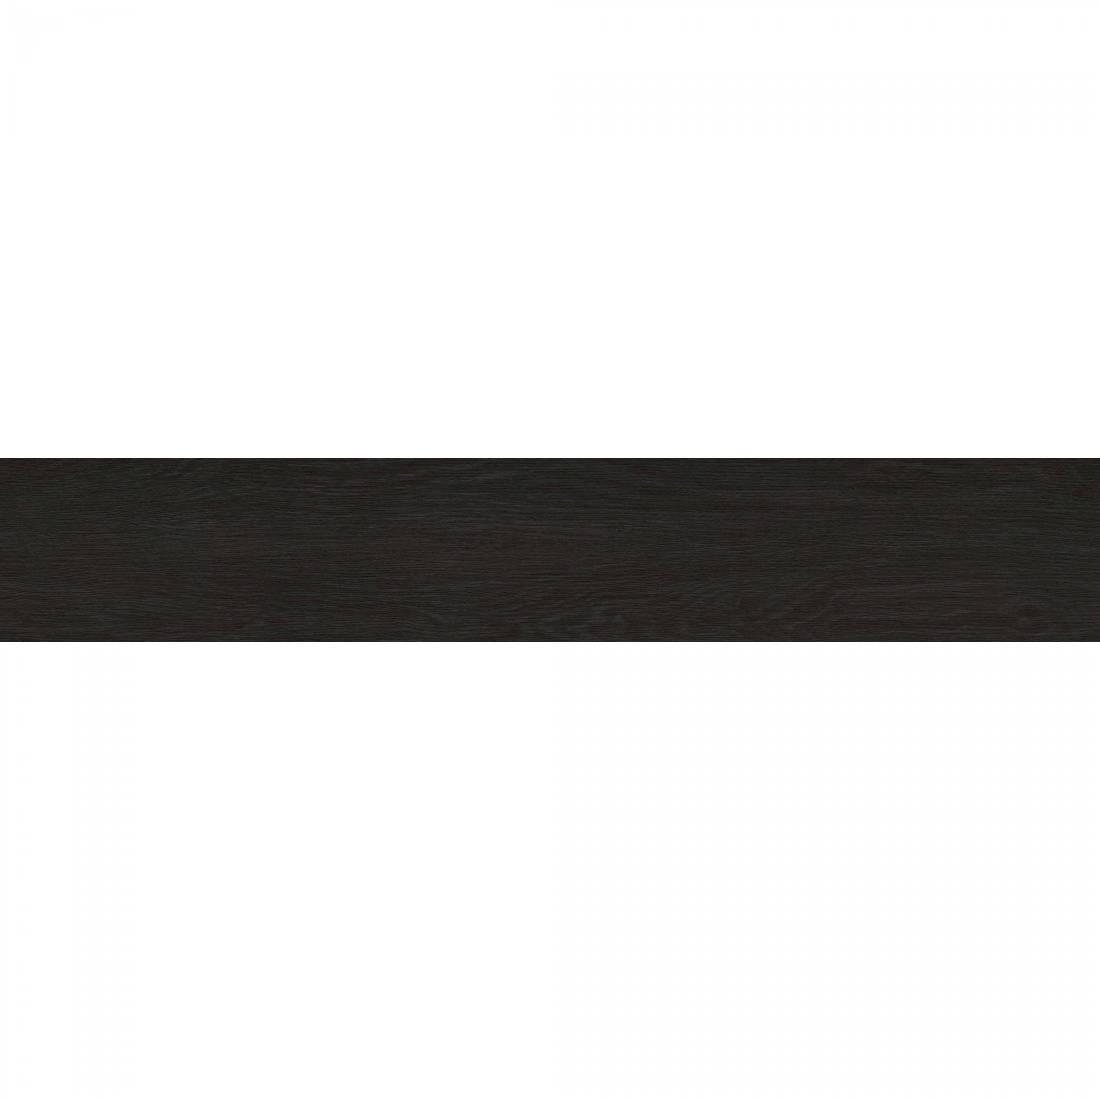 Long 20x120 MDE33 Black Matt